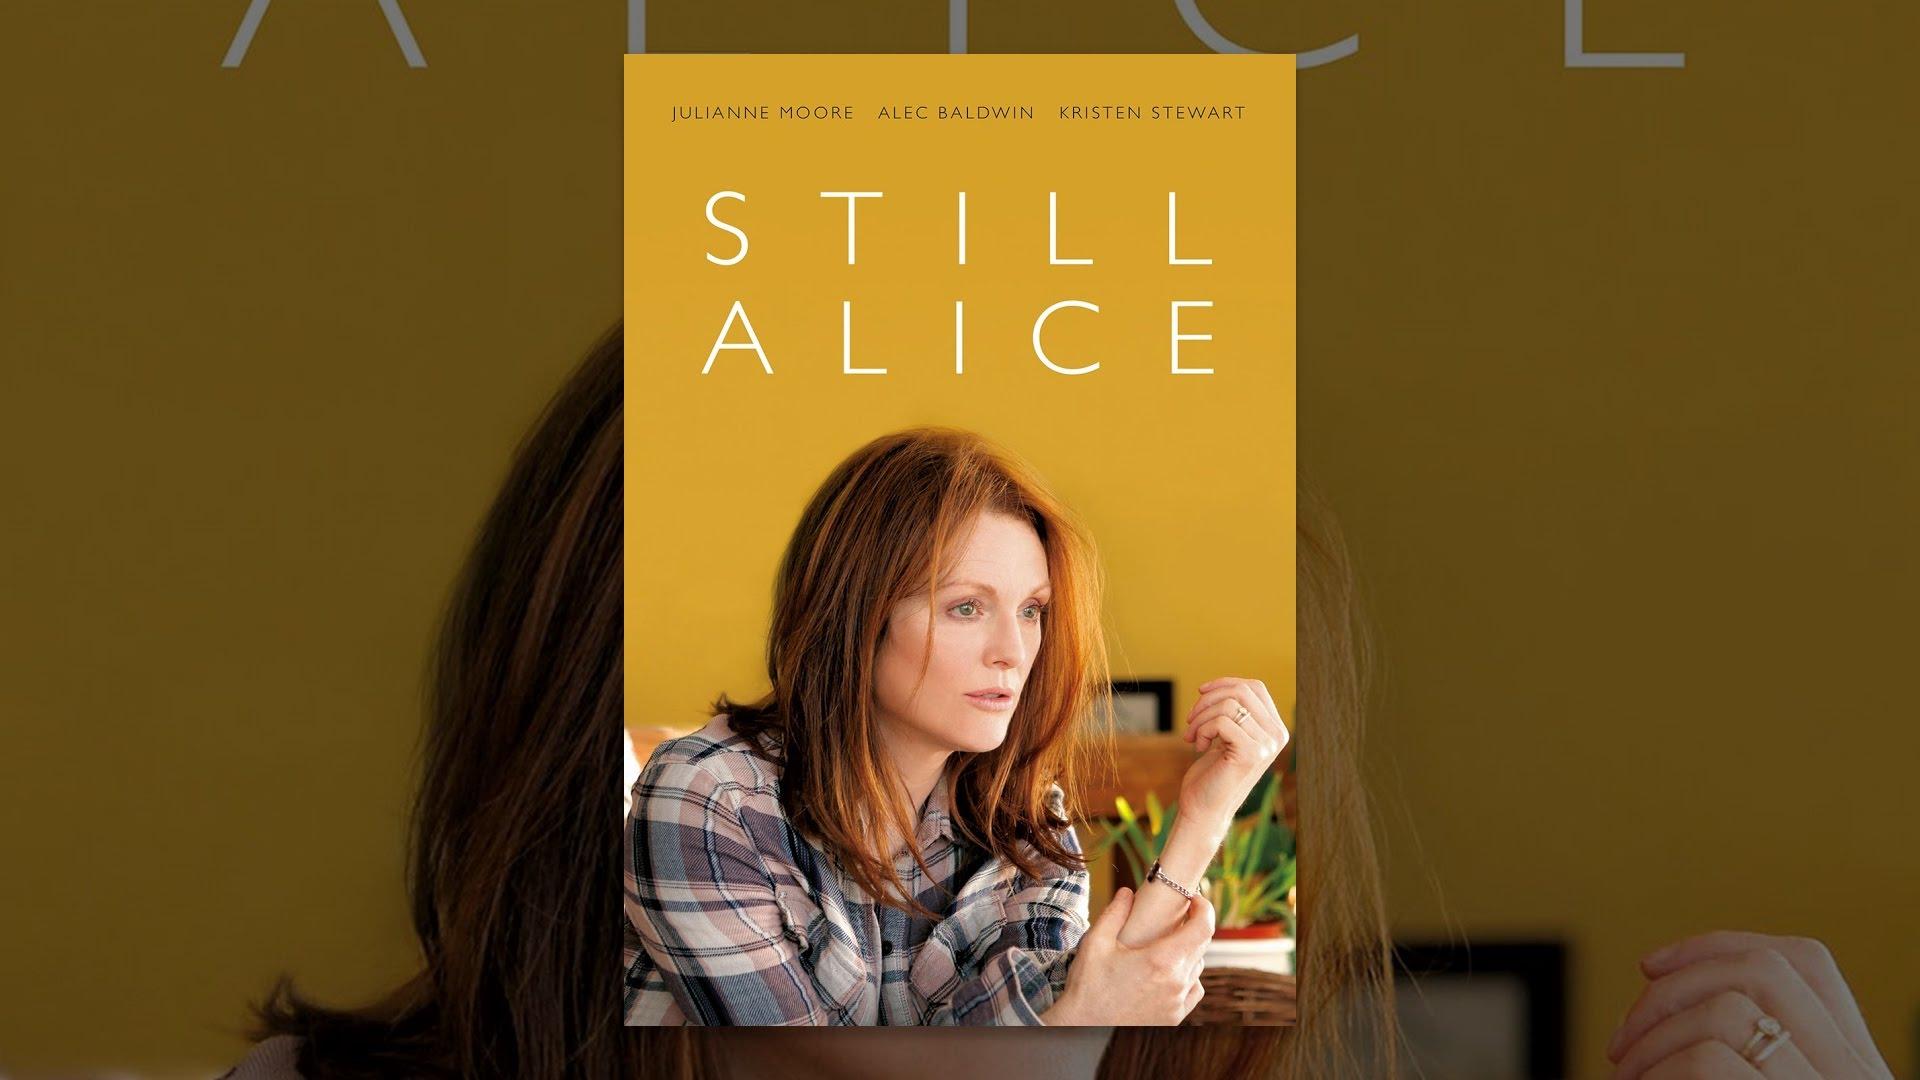 Jeg er stadig Alice (Still Alice)